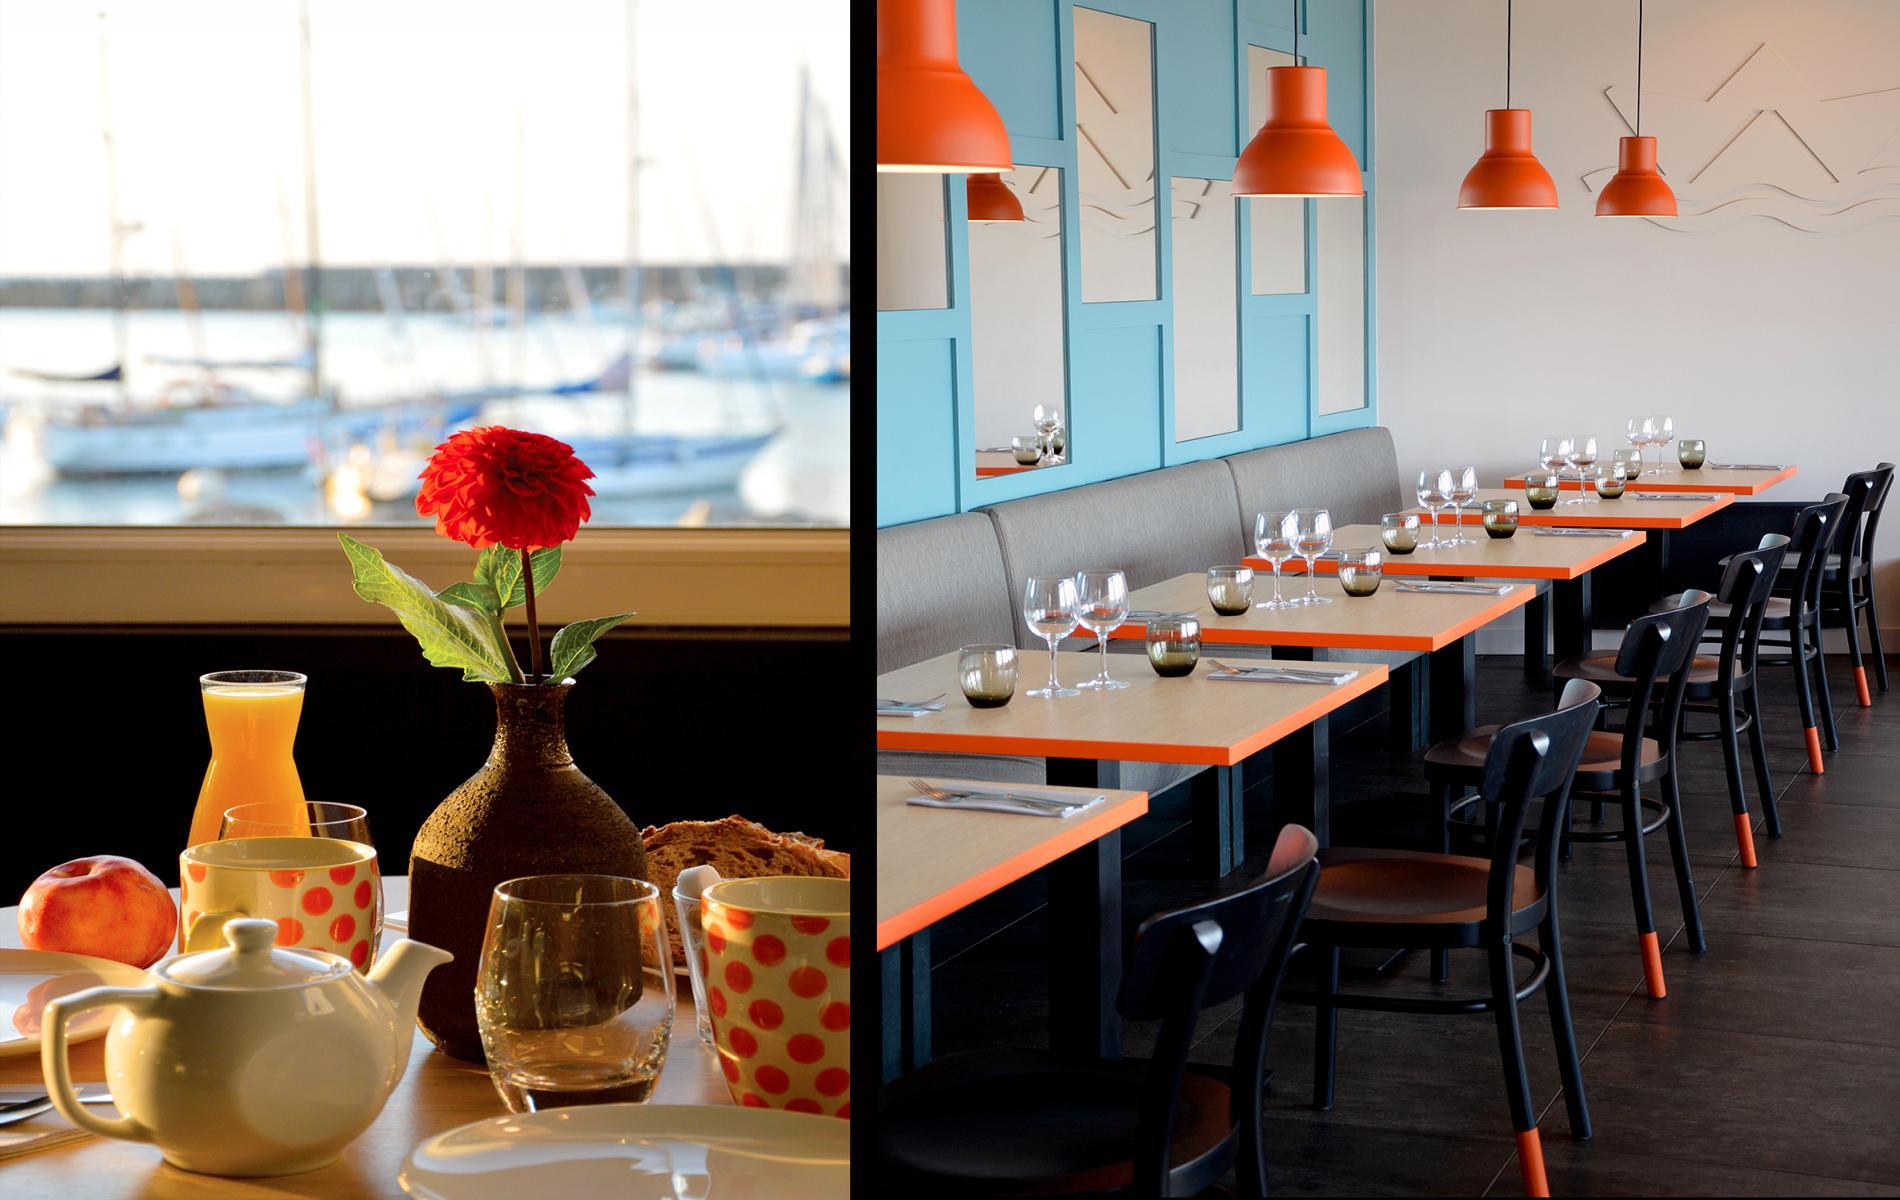 Petit déjeuner/salle de restaurant